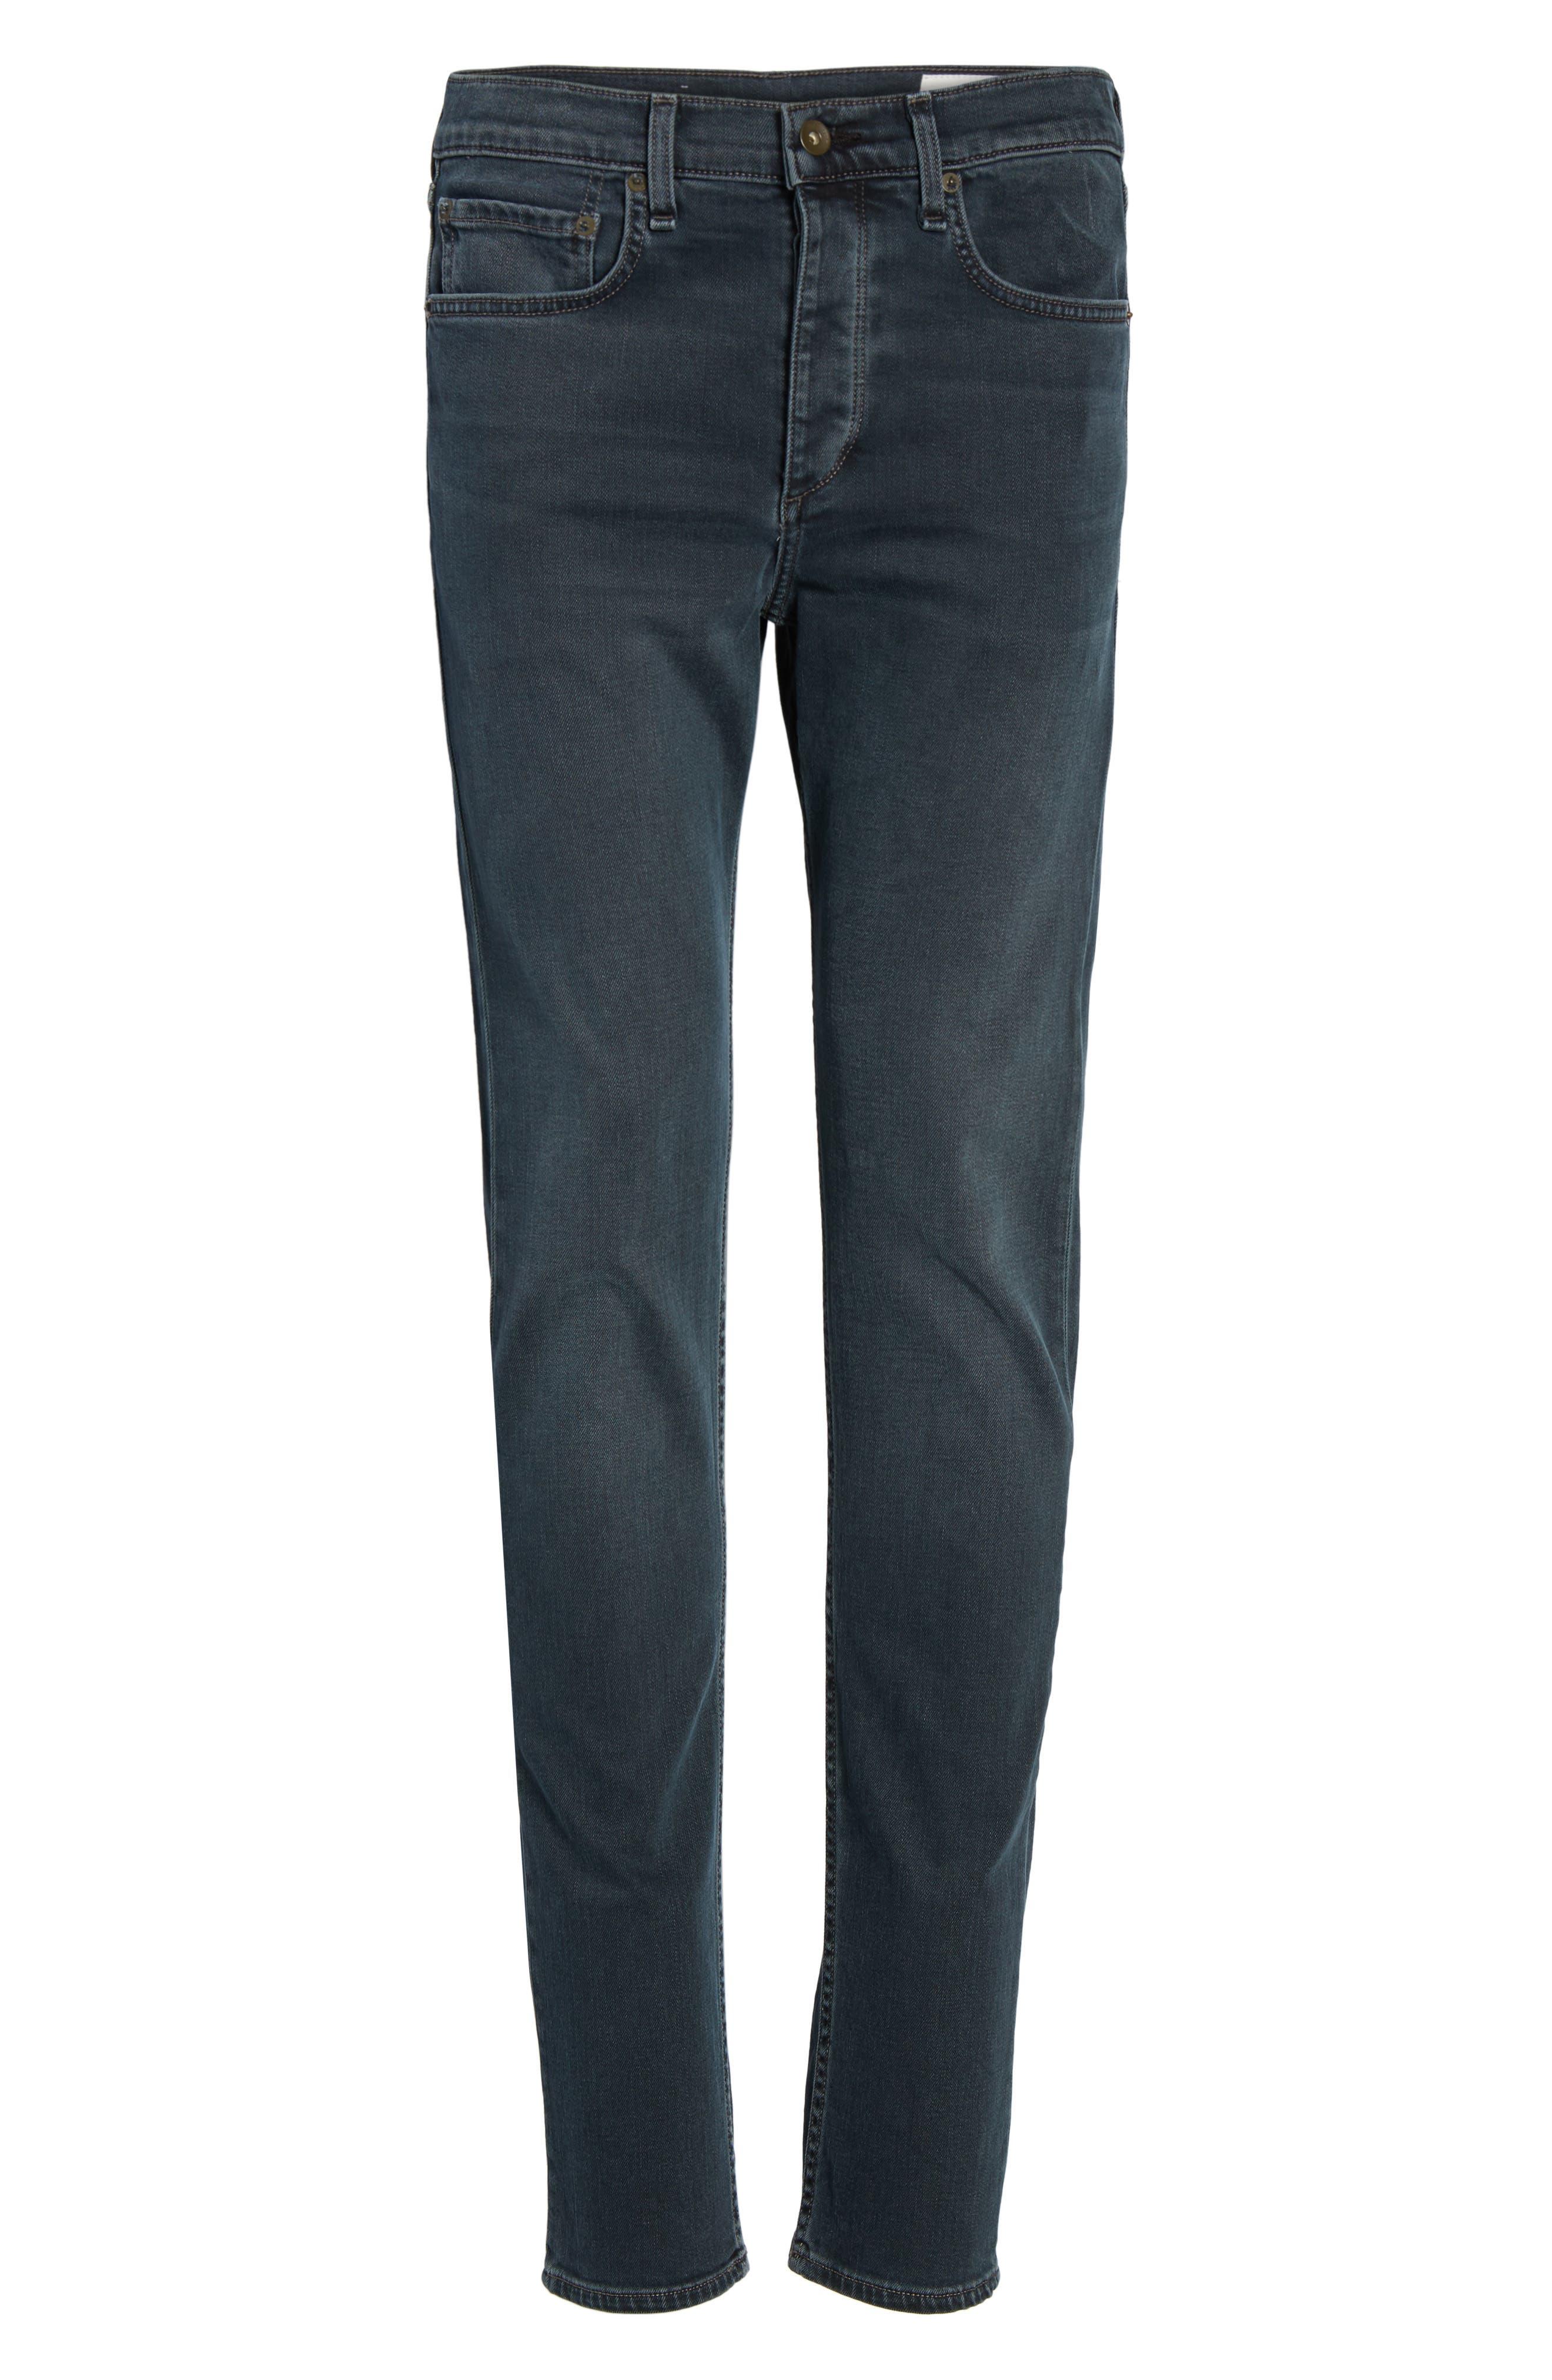 RAG & BONE, Fit 2 Slim Fit Jeans, Alternate thumbnail 7, color, MINNA